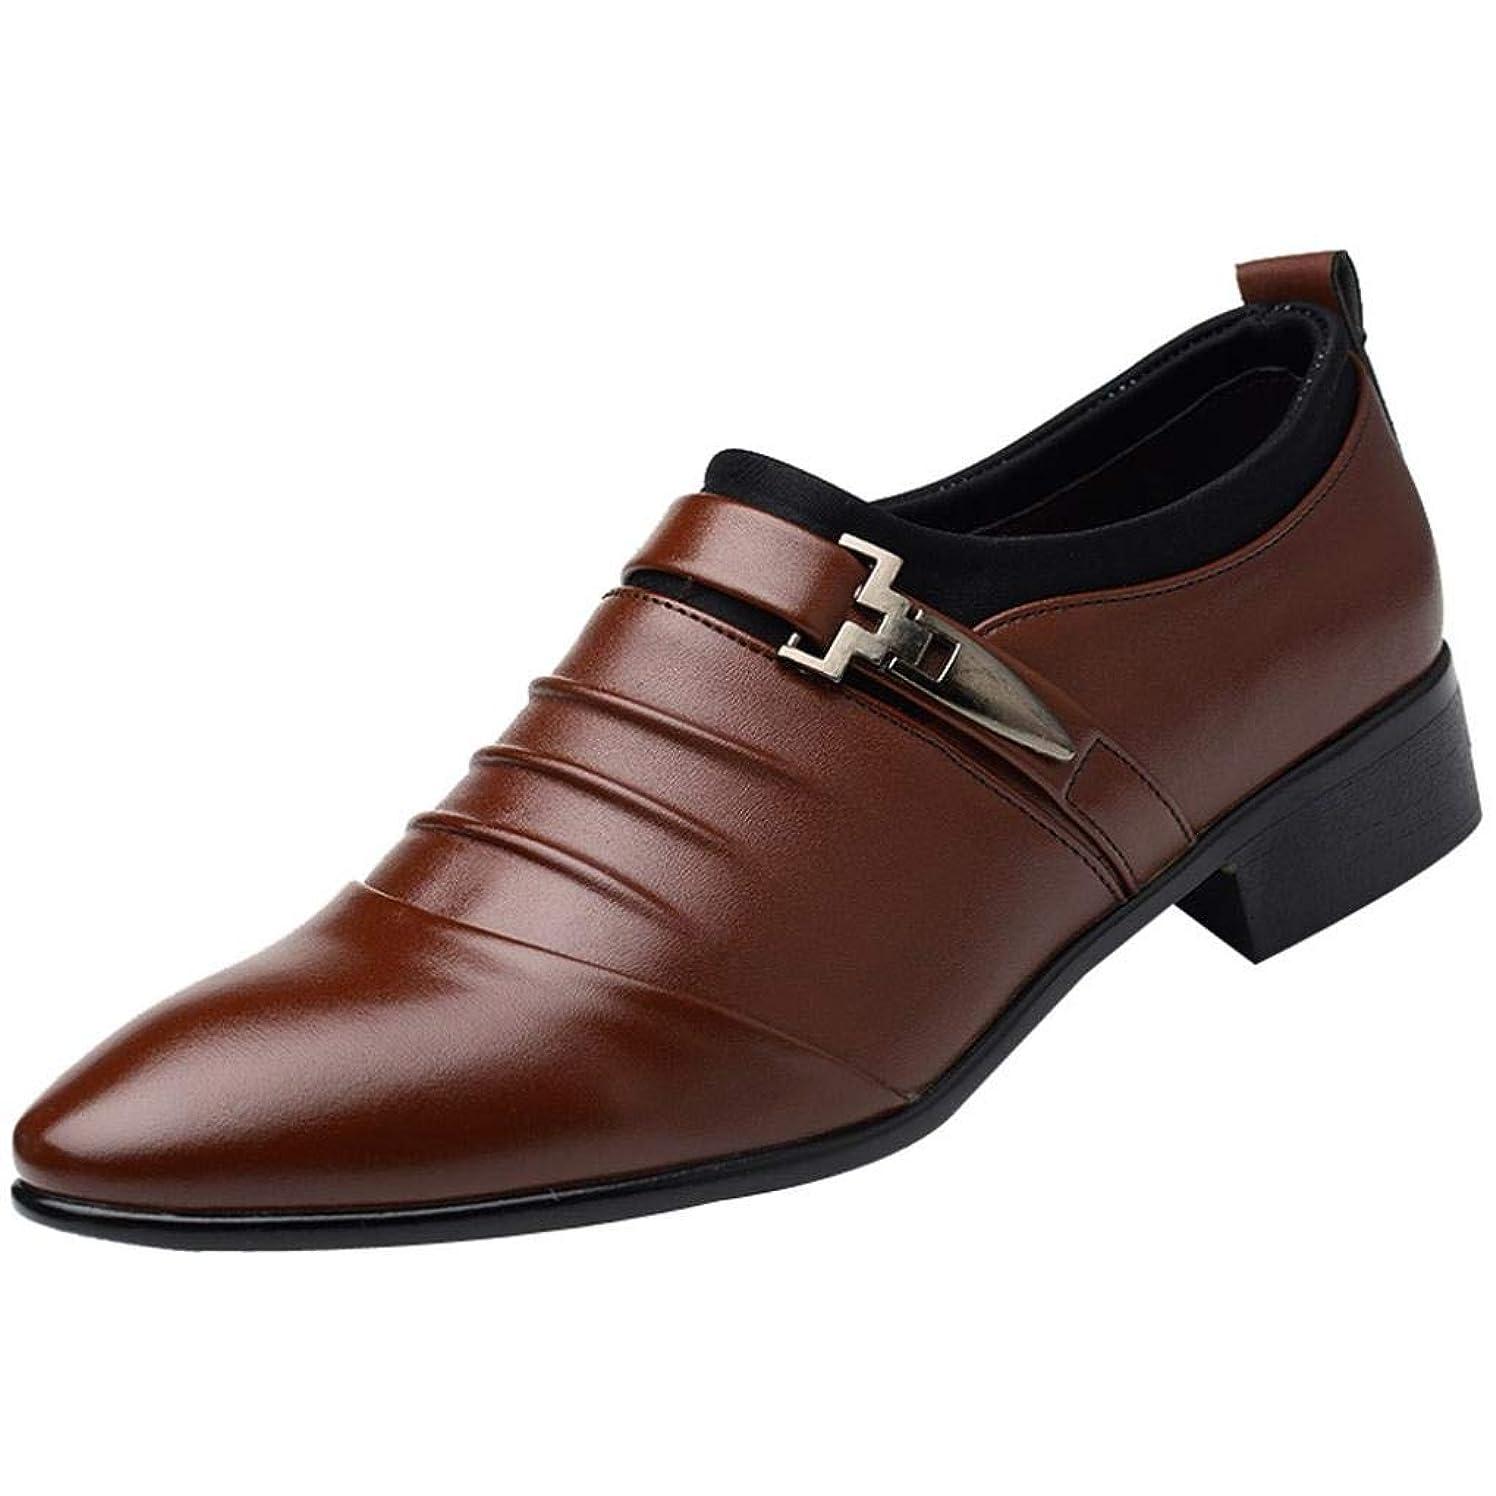 Limsea 2019 New British Fashion Men's Leather Pointed Toe FOrangemal Wedding Shoes